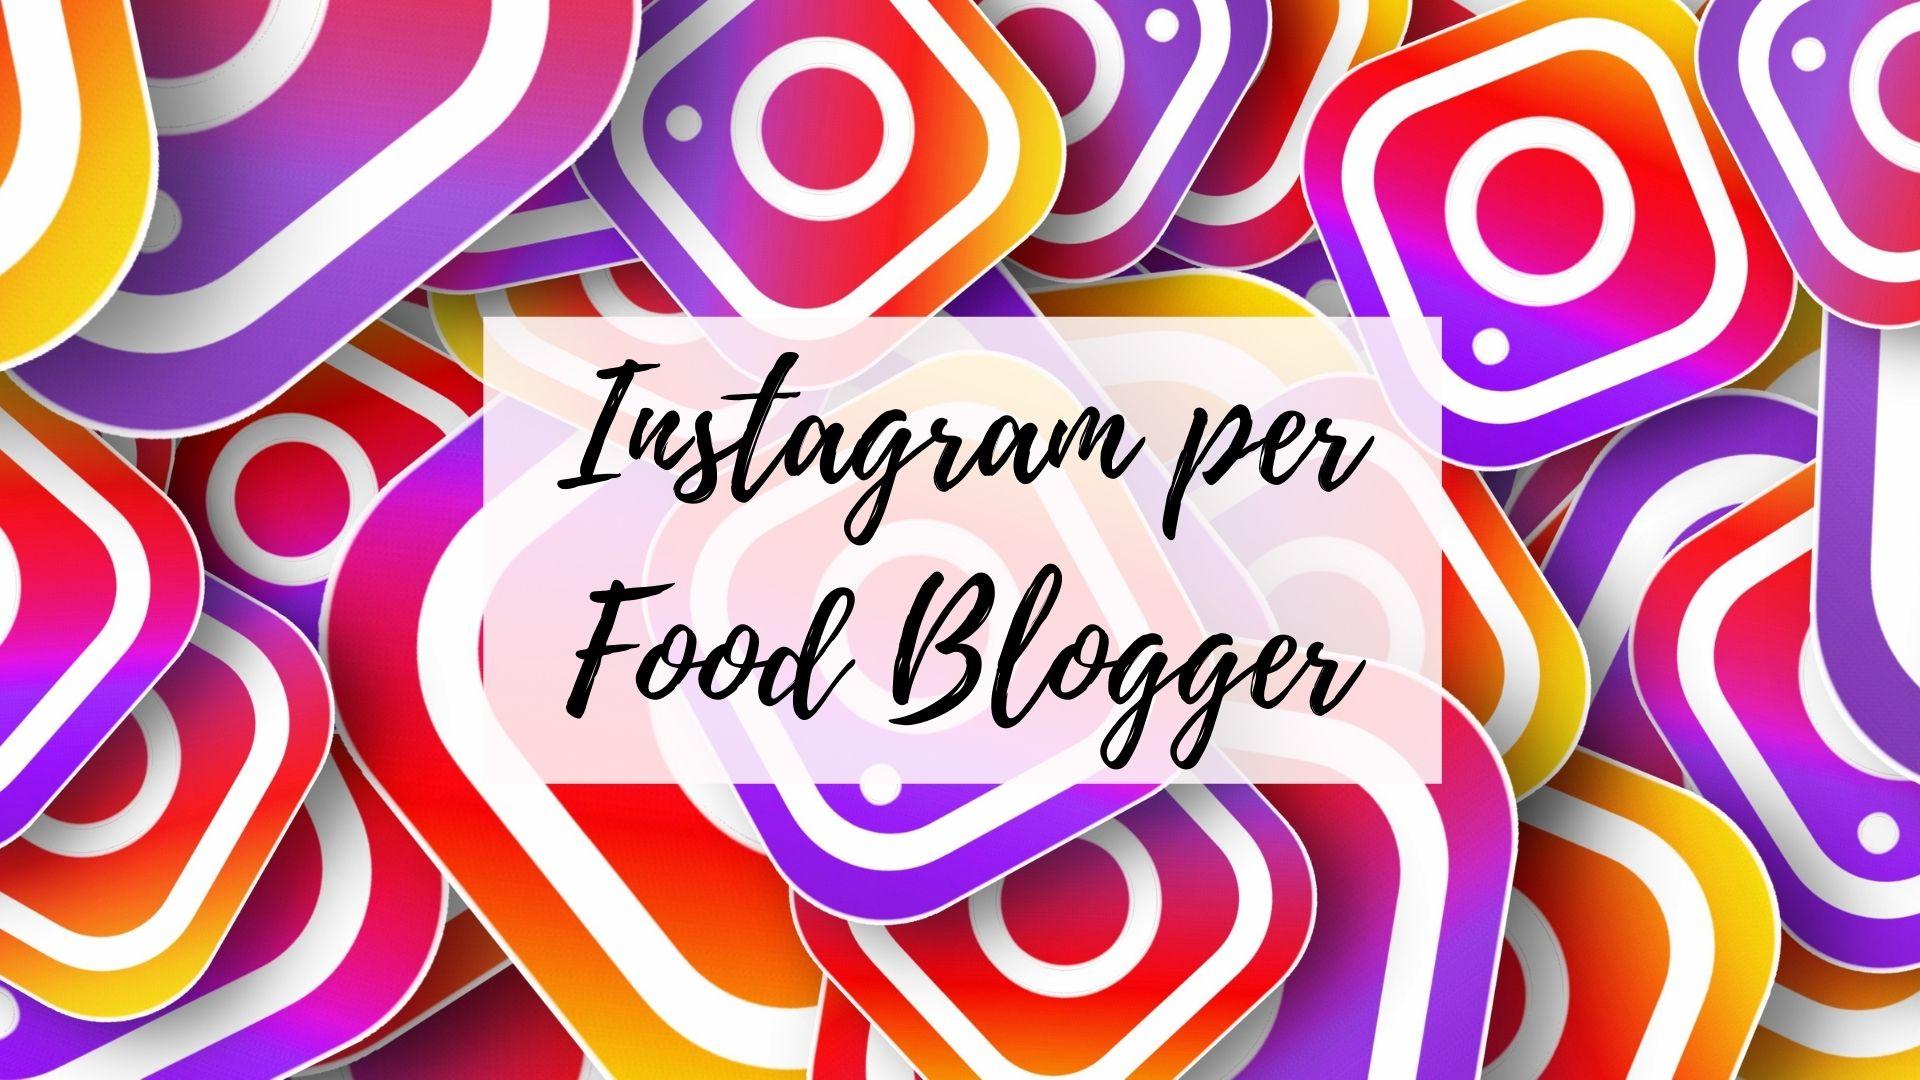 Instagram per food blogger